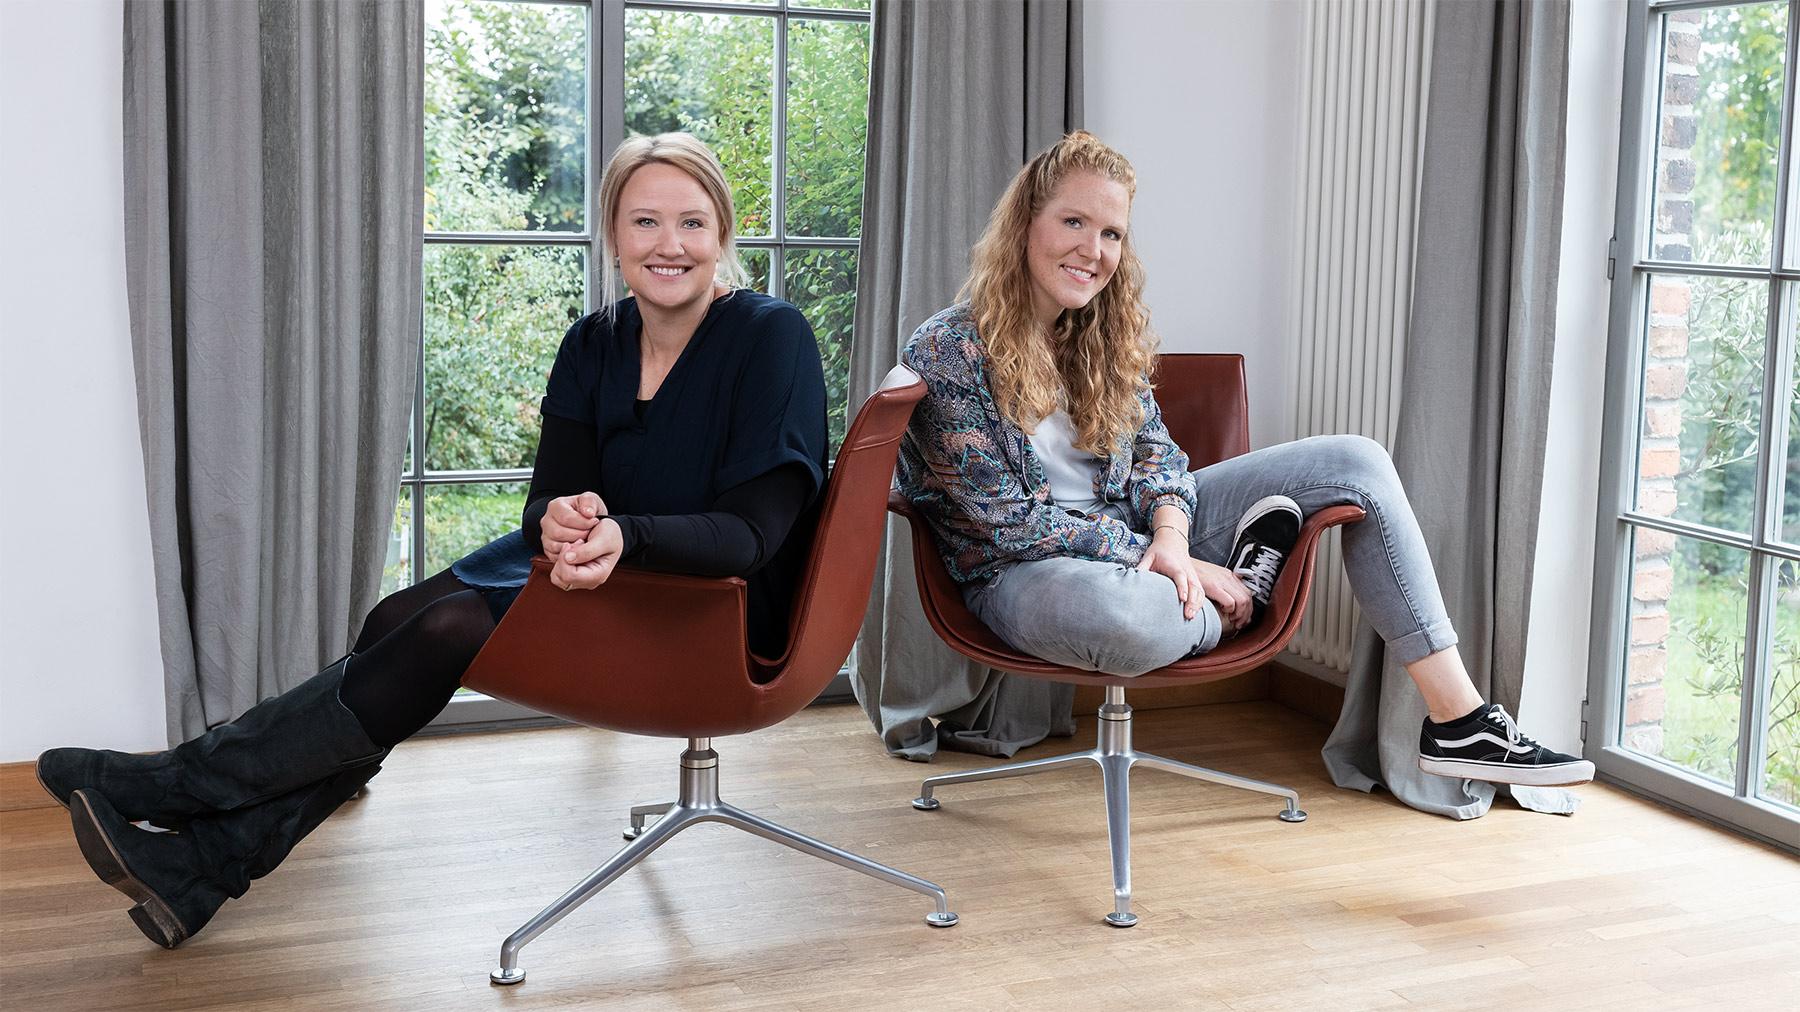 Businessfotografie Unternehmensfotografie Teamfoto Firmenportrait Designbüro